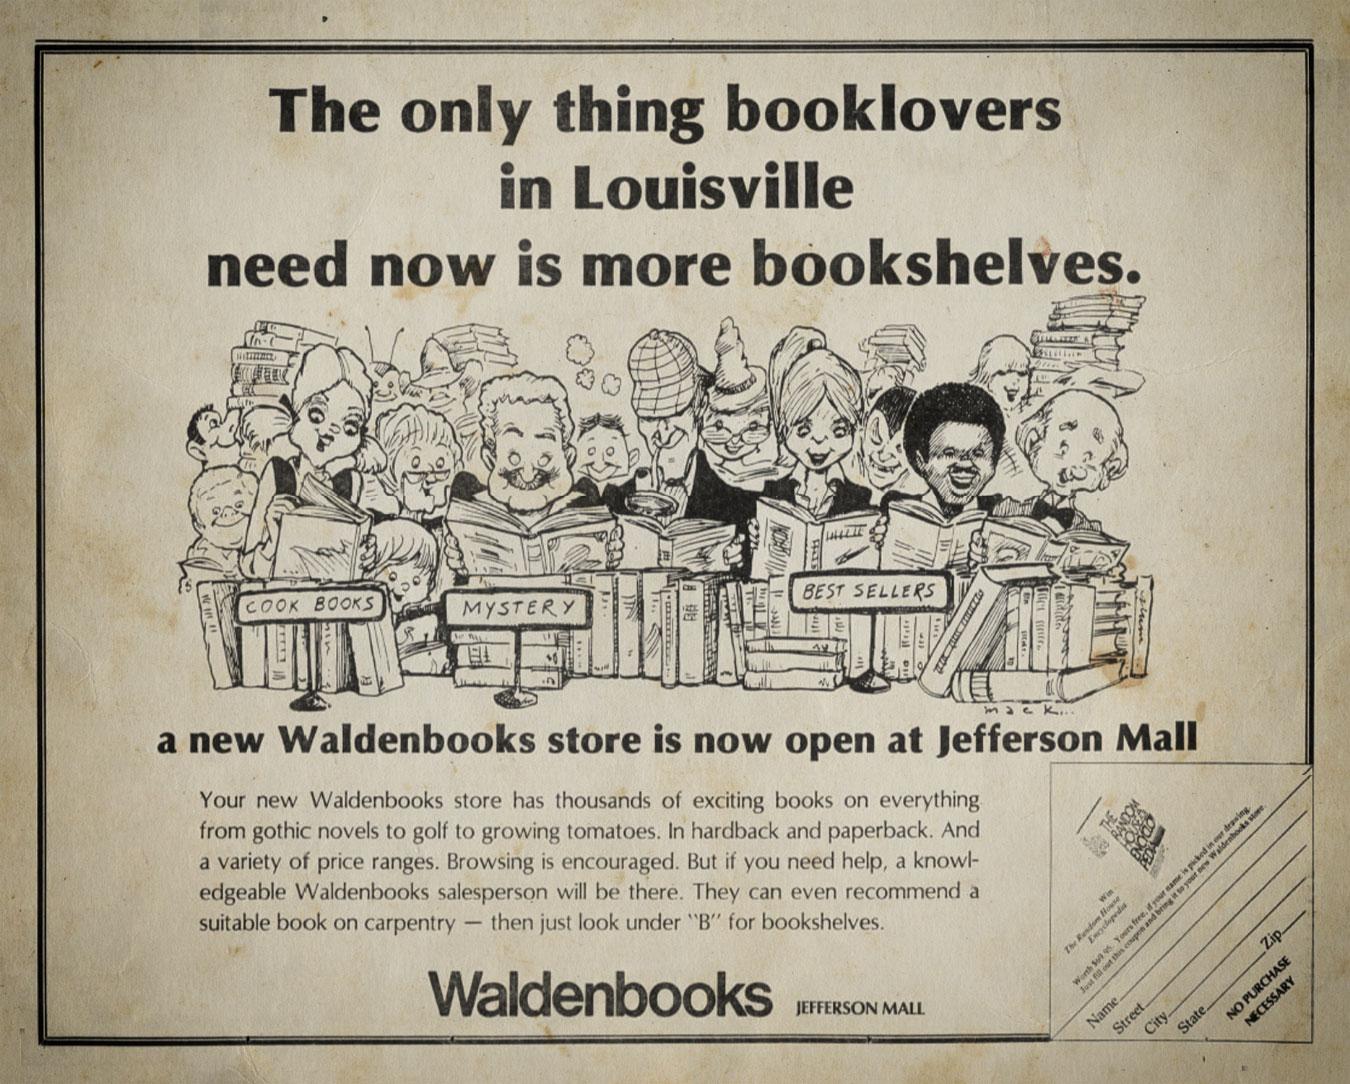 Jefferson Mall Waldenbooks advertisement